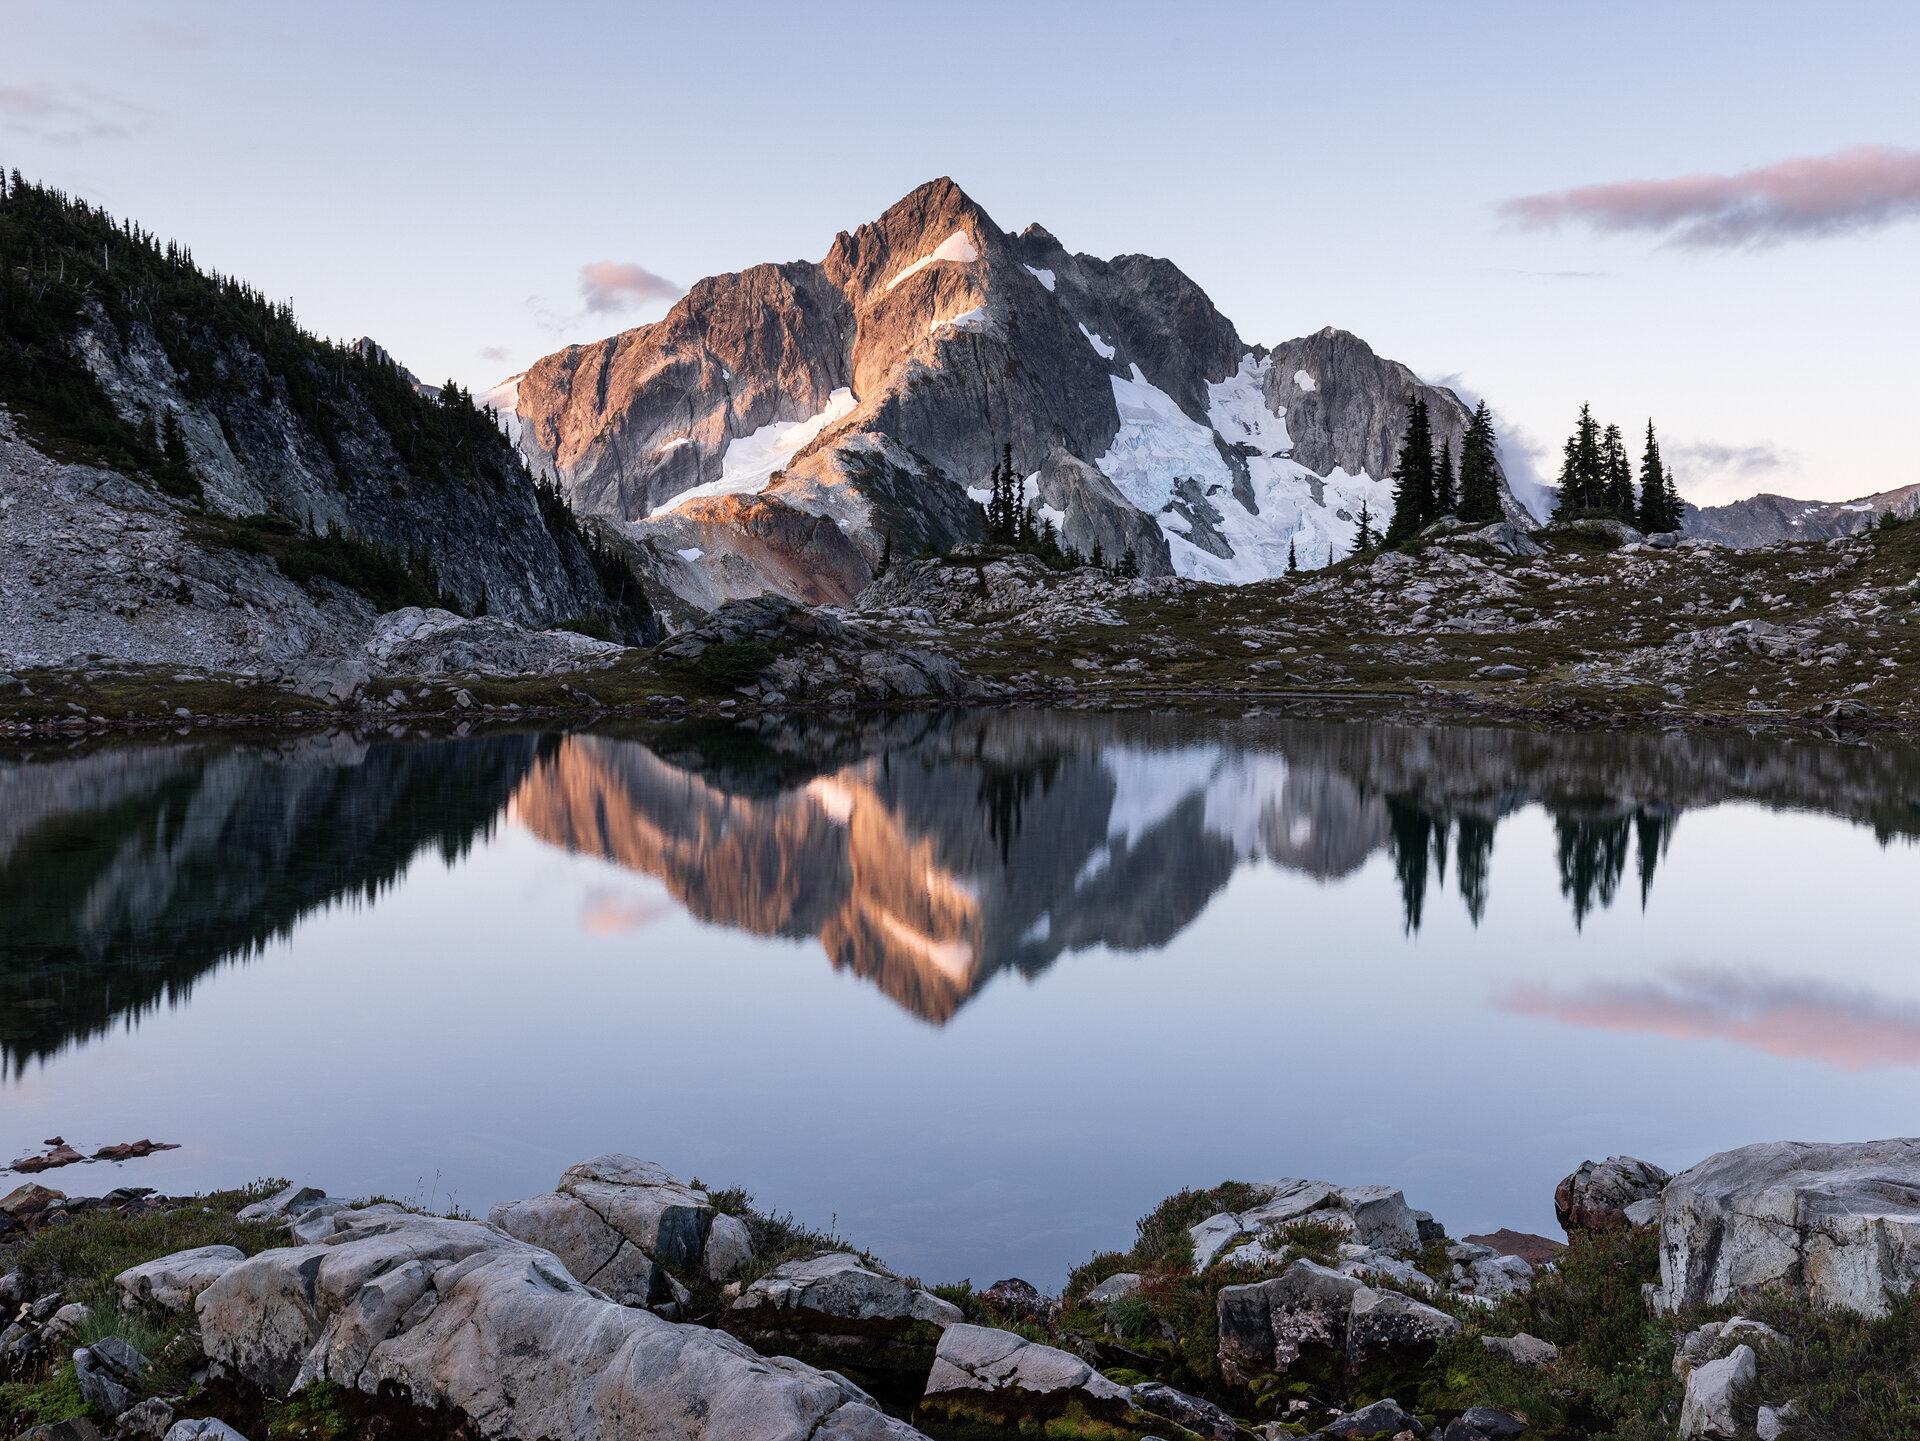 Whatcom Peak reflected in the lake at sunrise